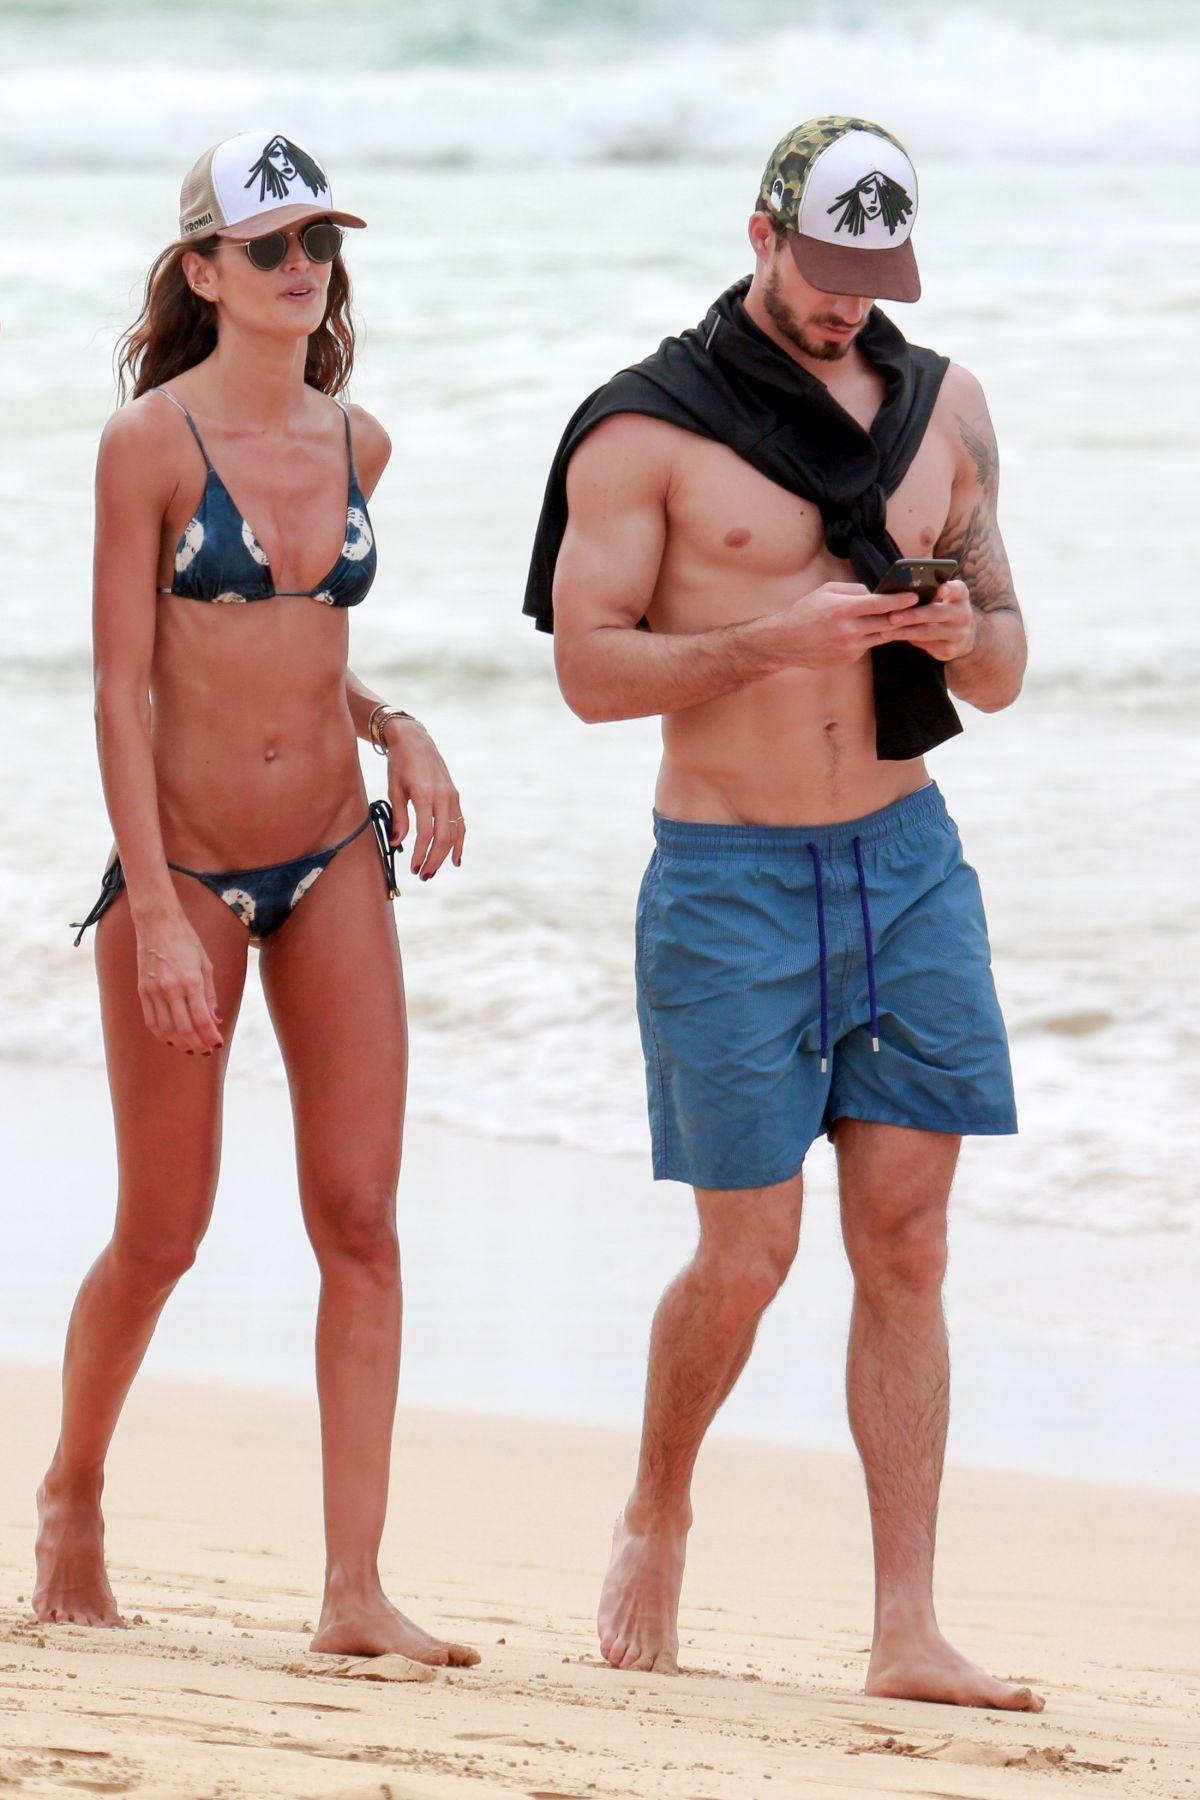 Izabel Goulart in Bikini and Kevin Trapp on the beach in Fernando de Noronha Pic 22 of 35